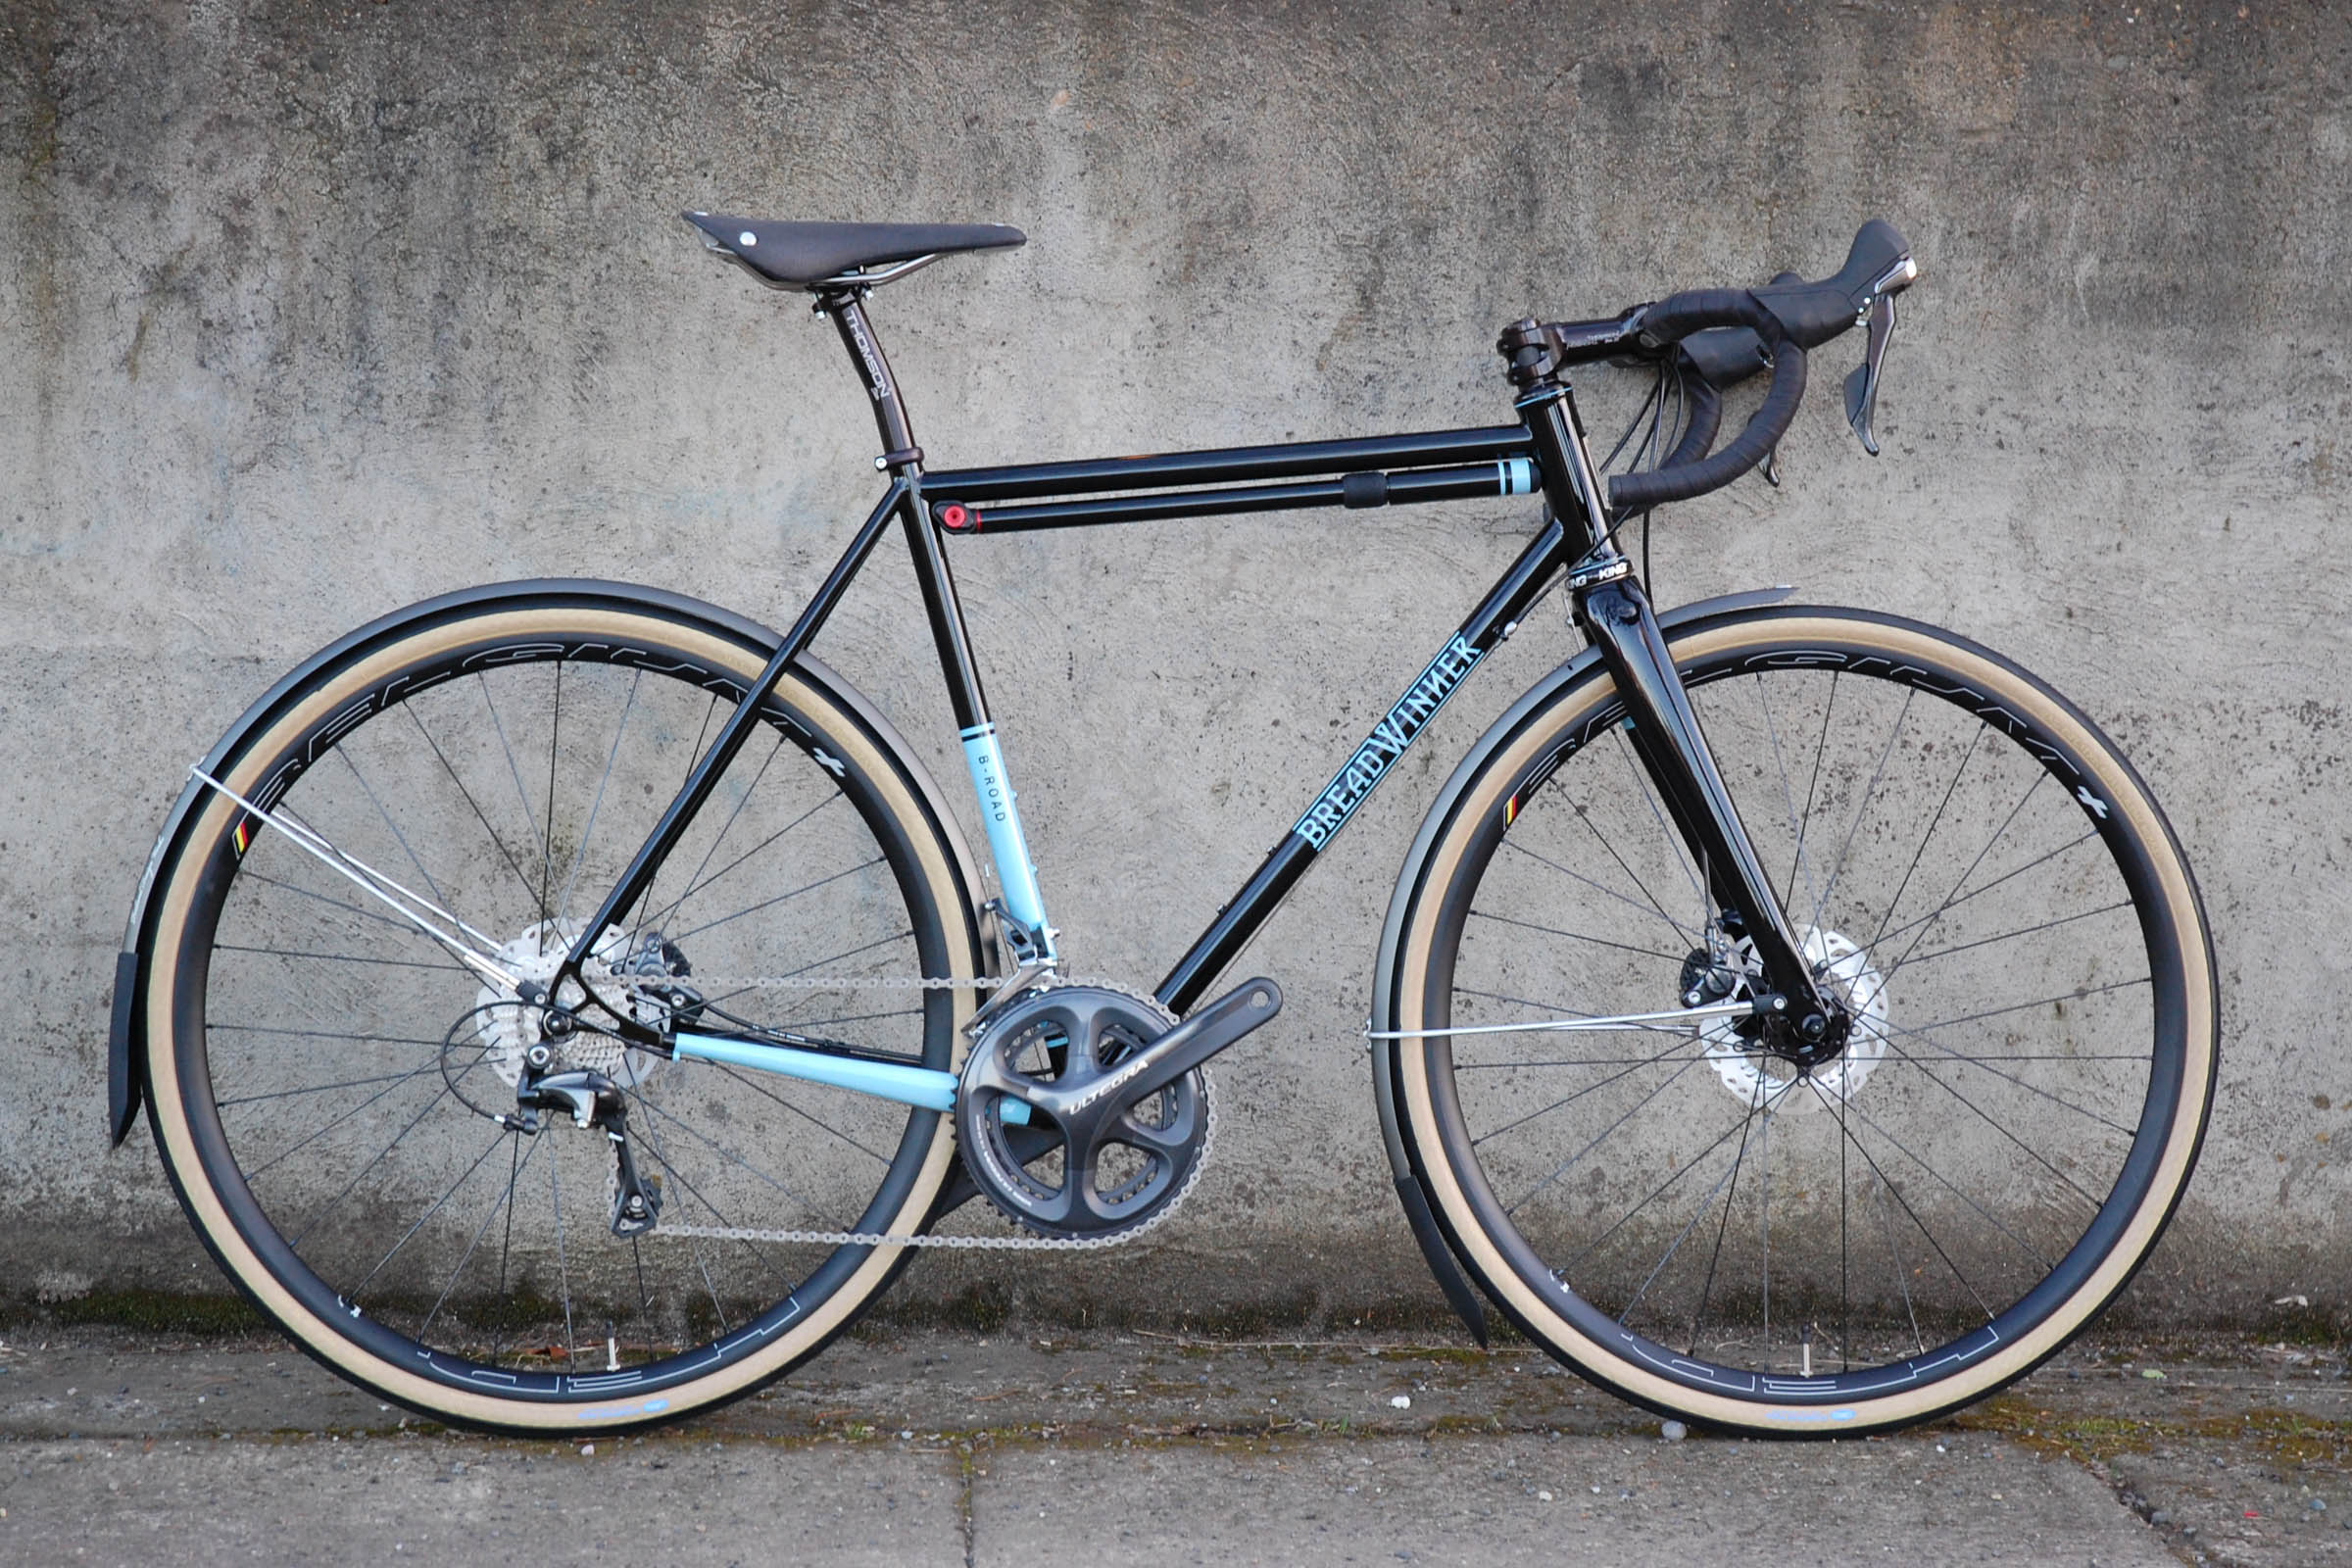 B-Road – Breadwinner Cycles